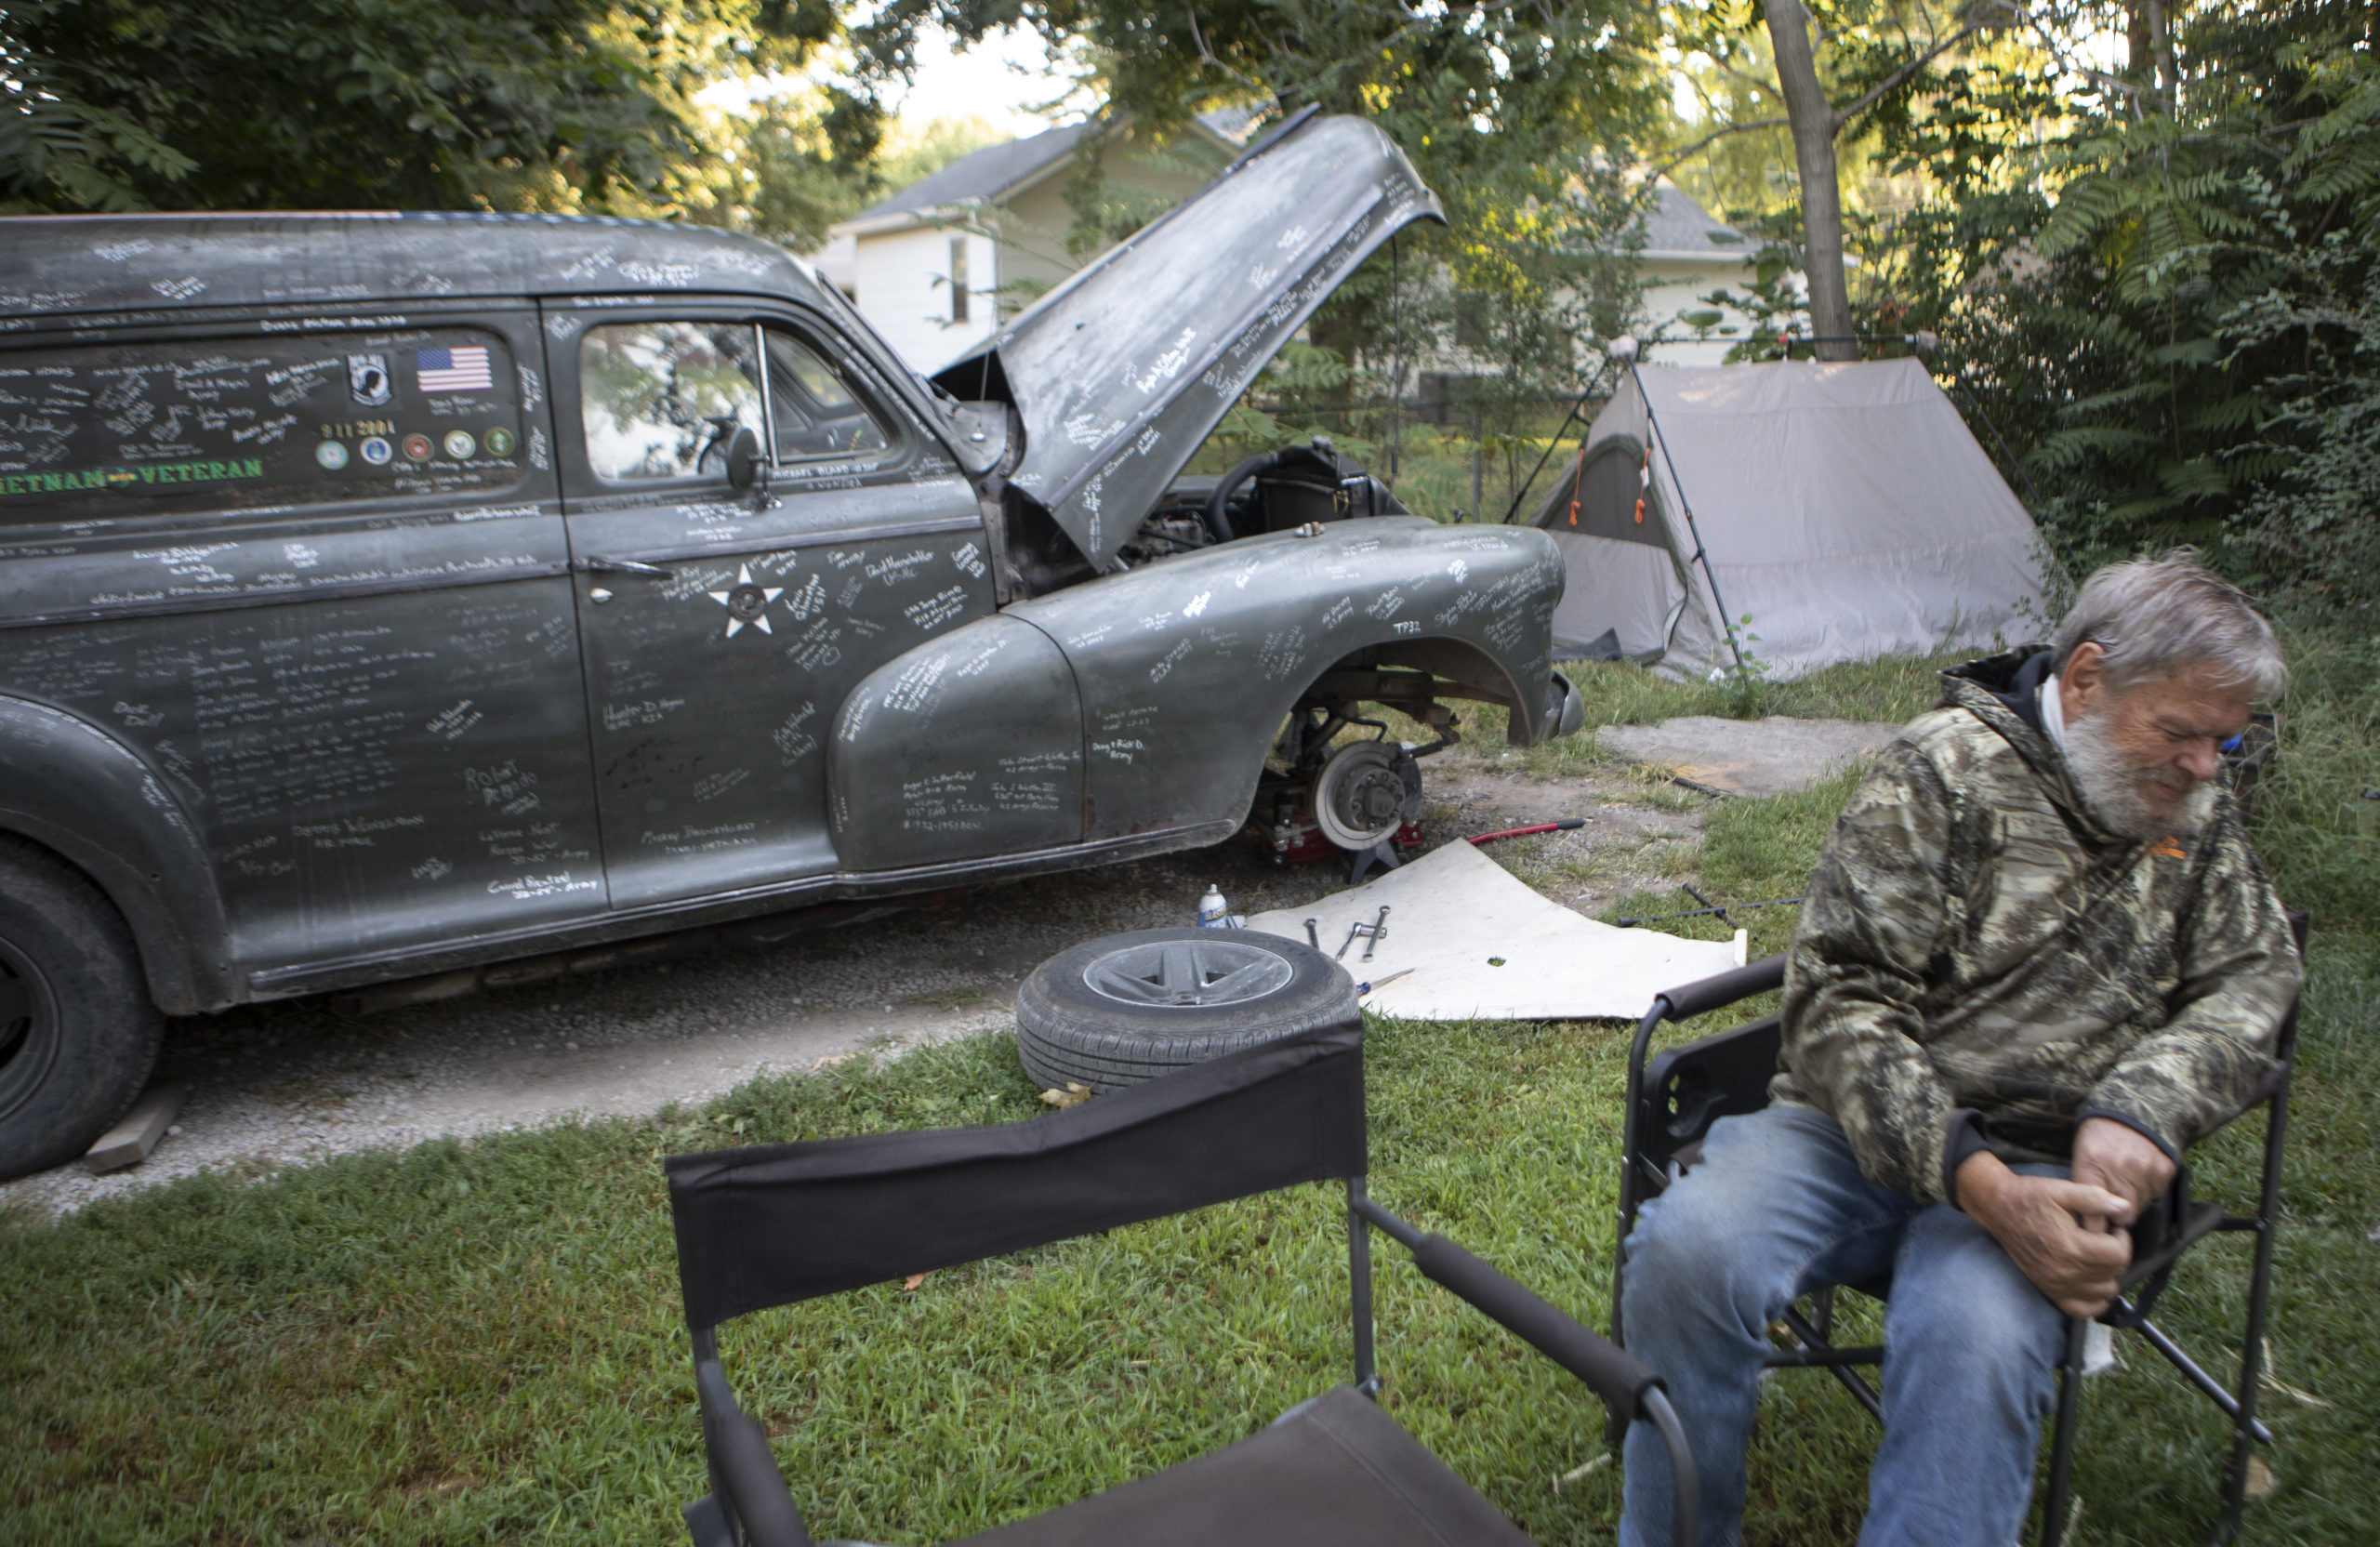 SamAugheFinal 11 1 scaled - Mobile Memorial: Sleepless night creates veteran memorial